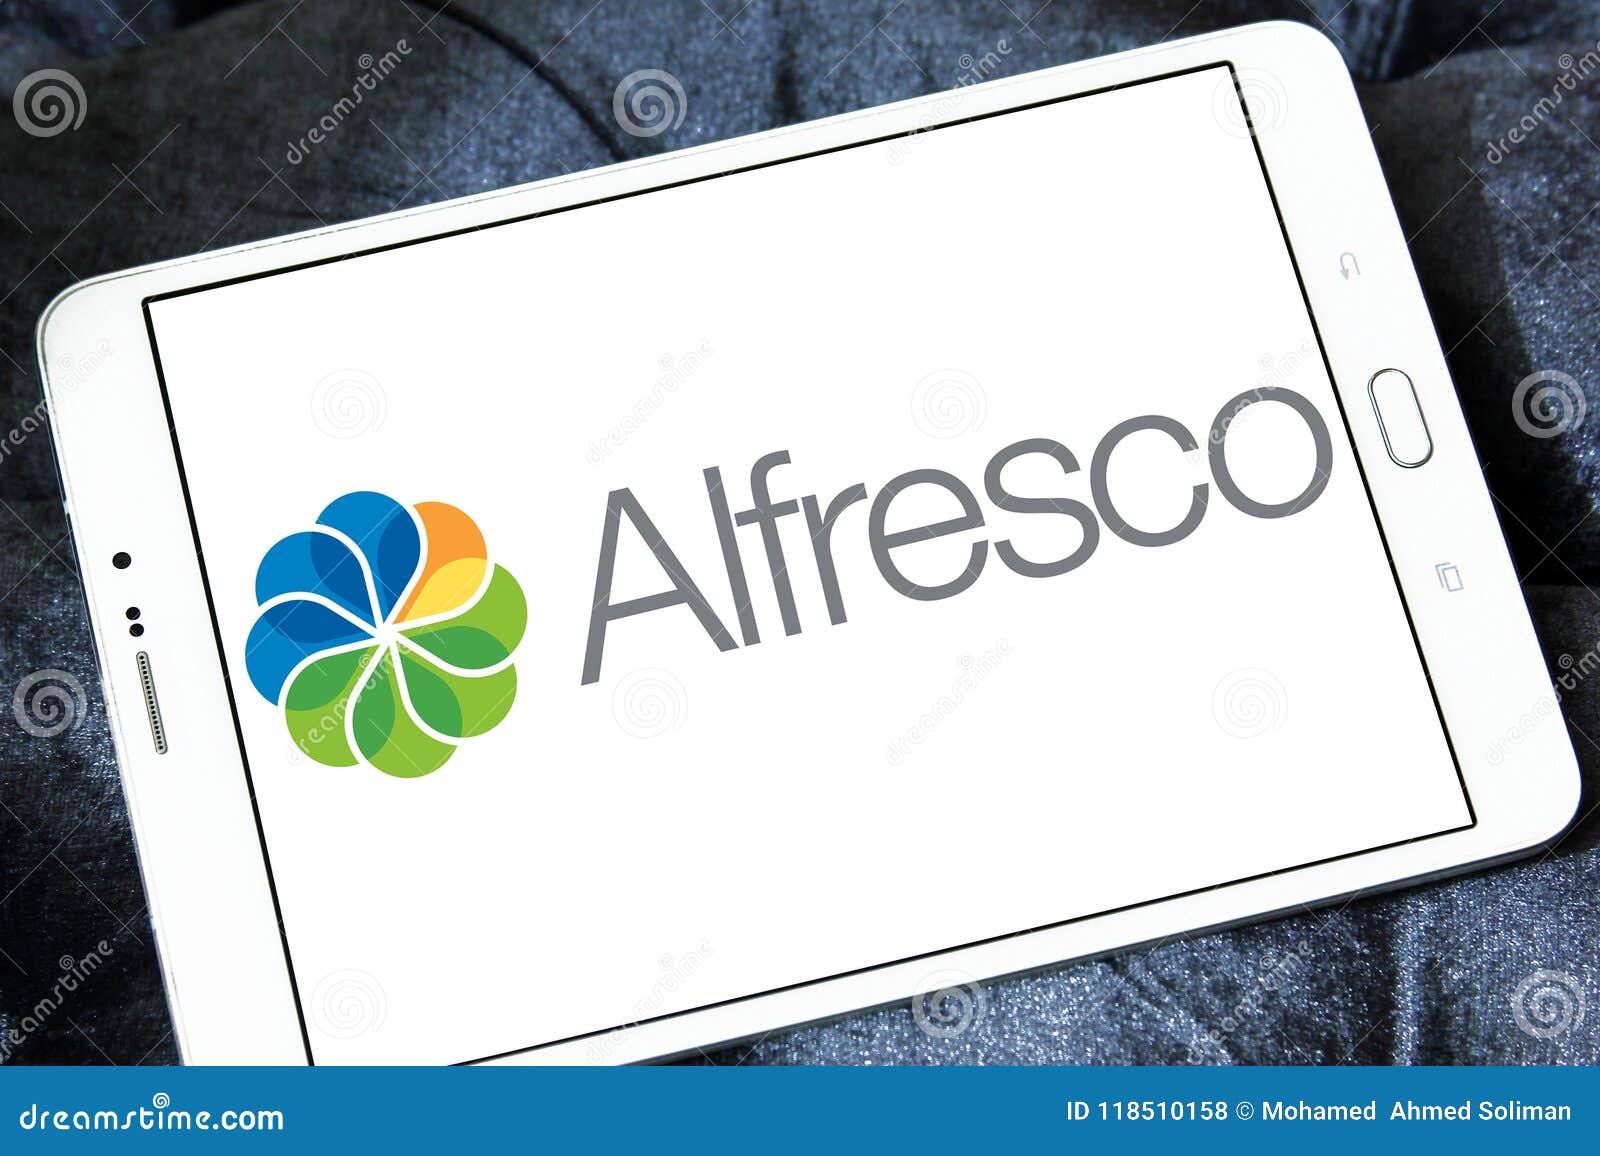 Alfresco software logo editorial stock photo  Image of java